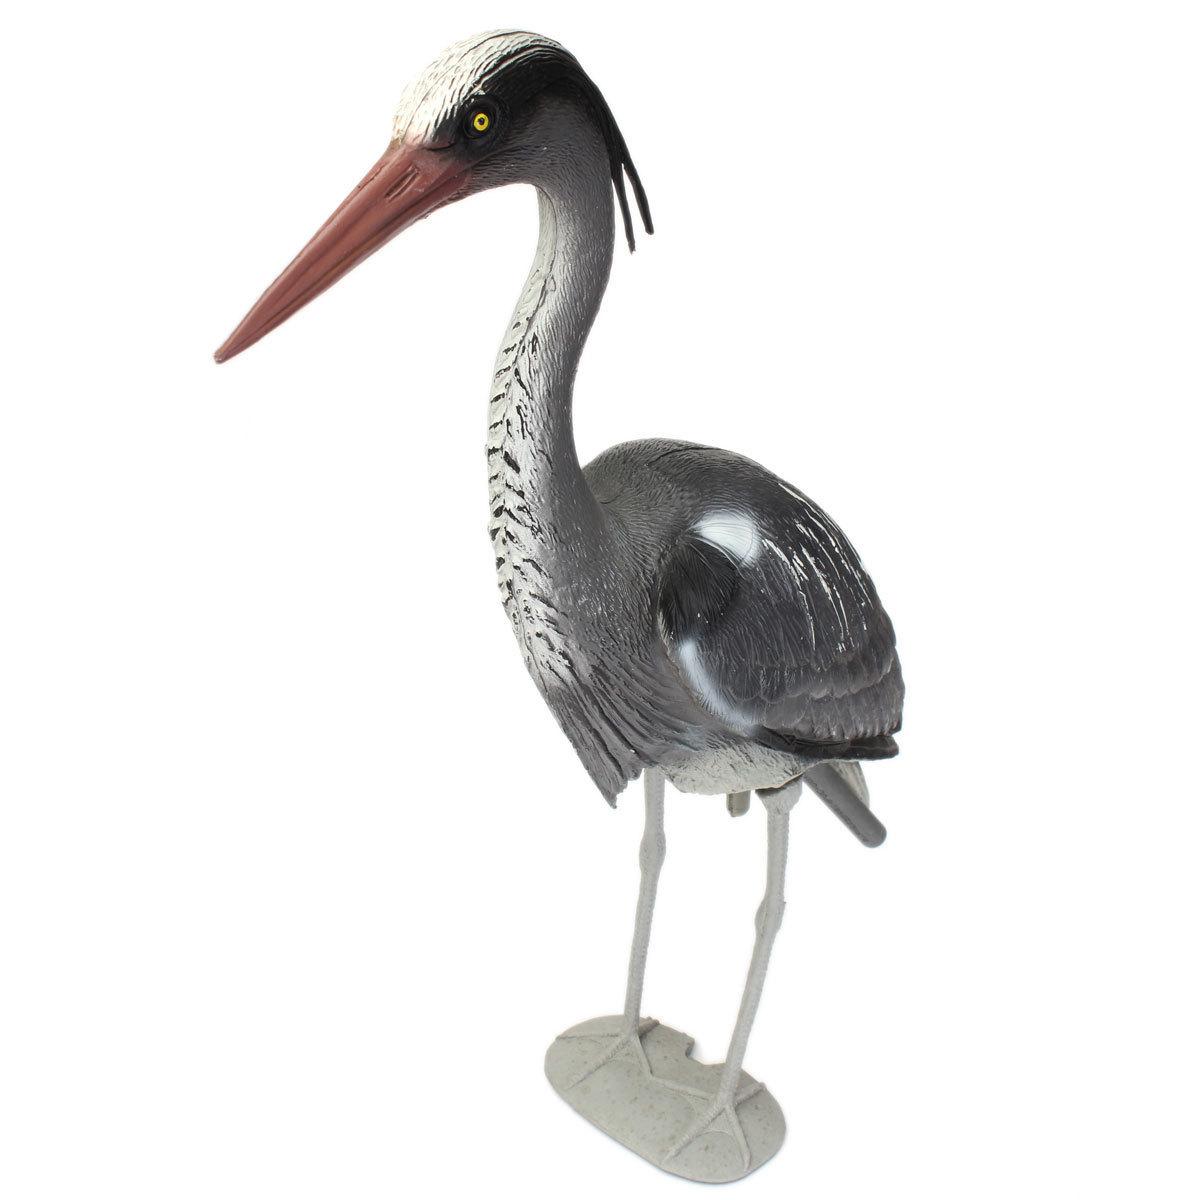 Heron garden ornament - Large Plastic Resin Decoy Heron Garden Ornament Bird Scarer Fish Pond Koi Carp Lazada Ph